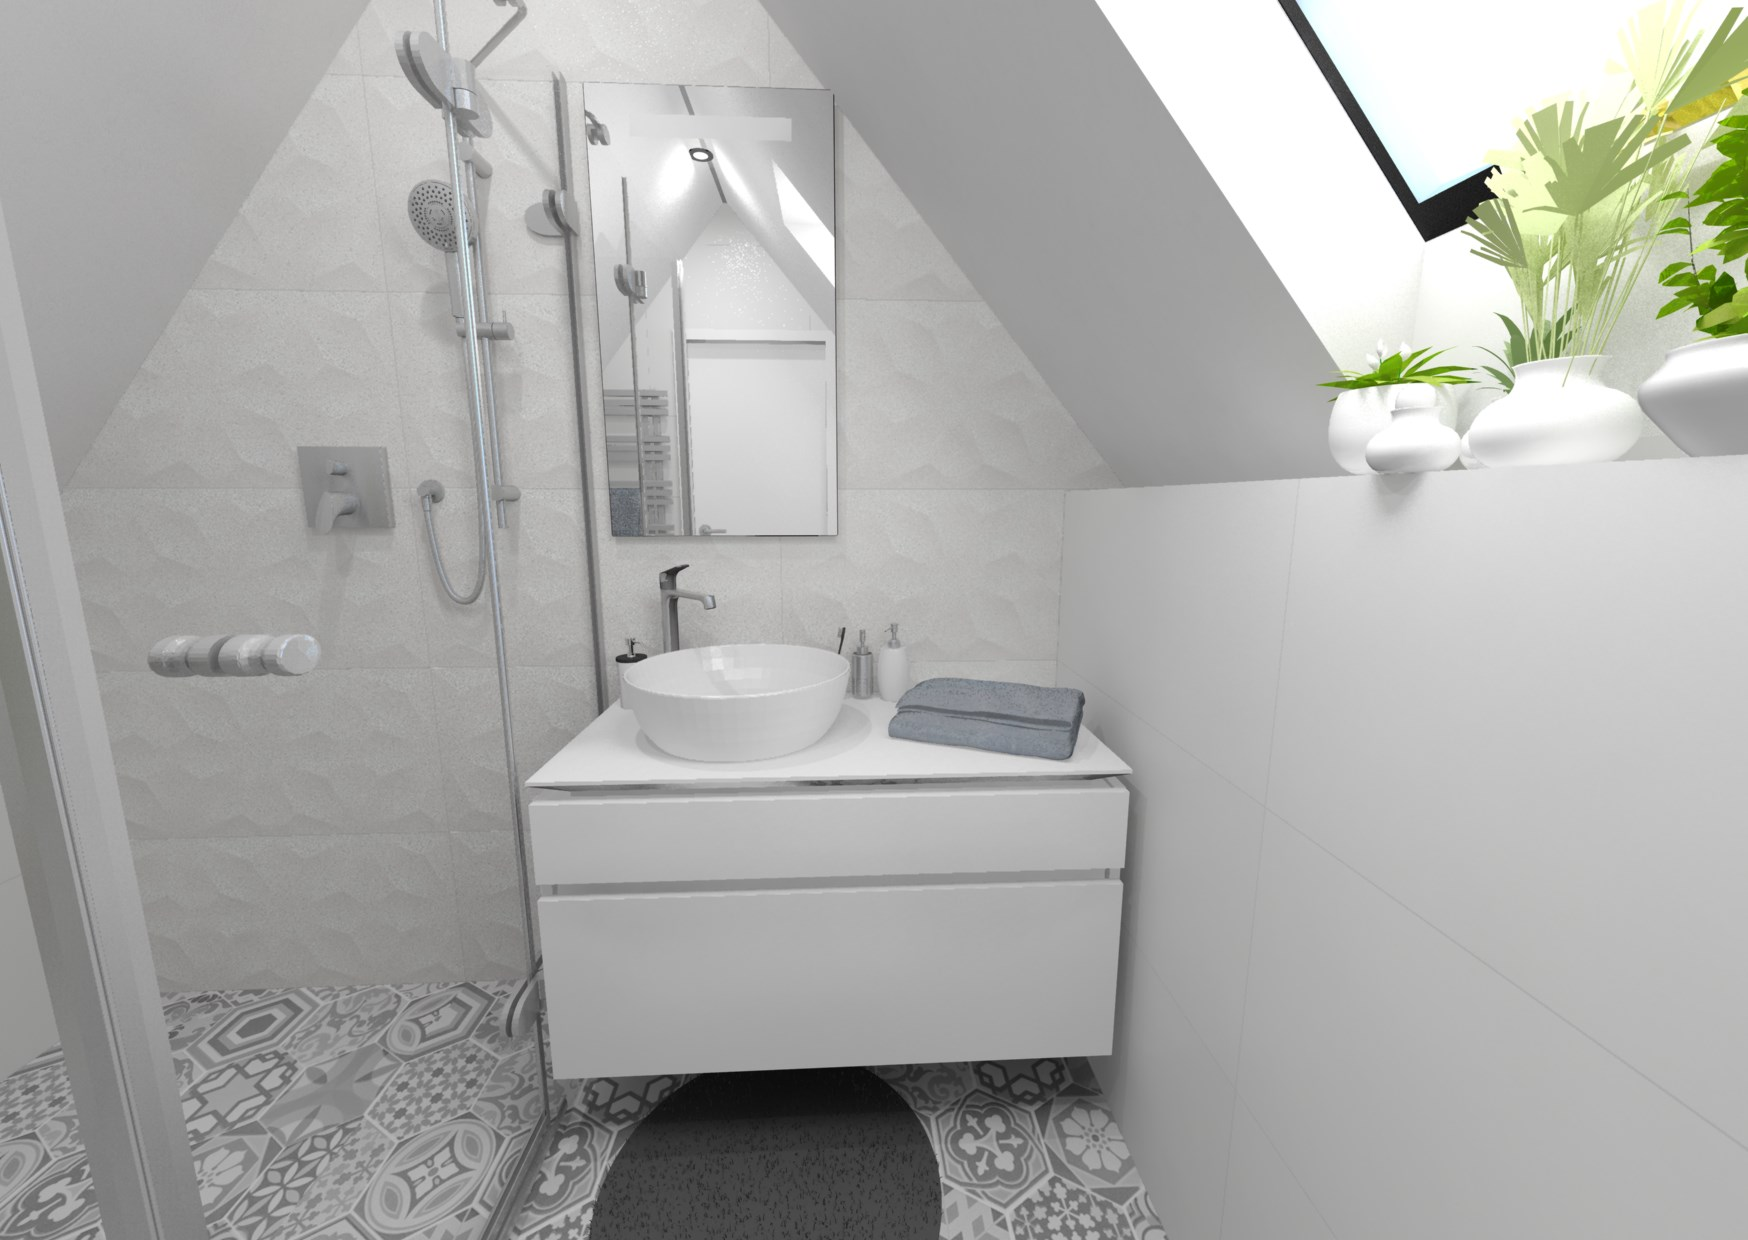 Návrh retro koupelny